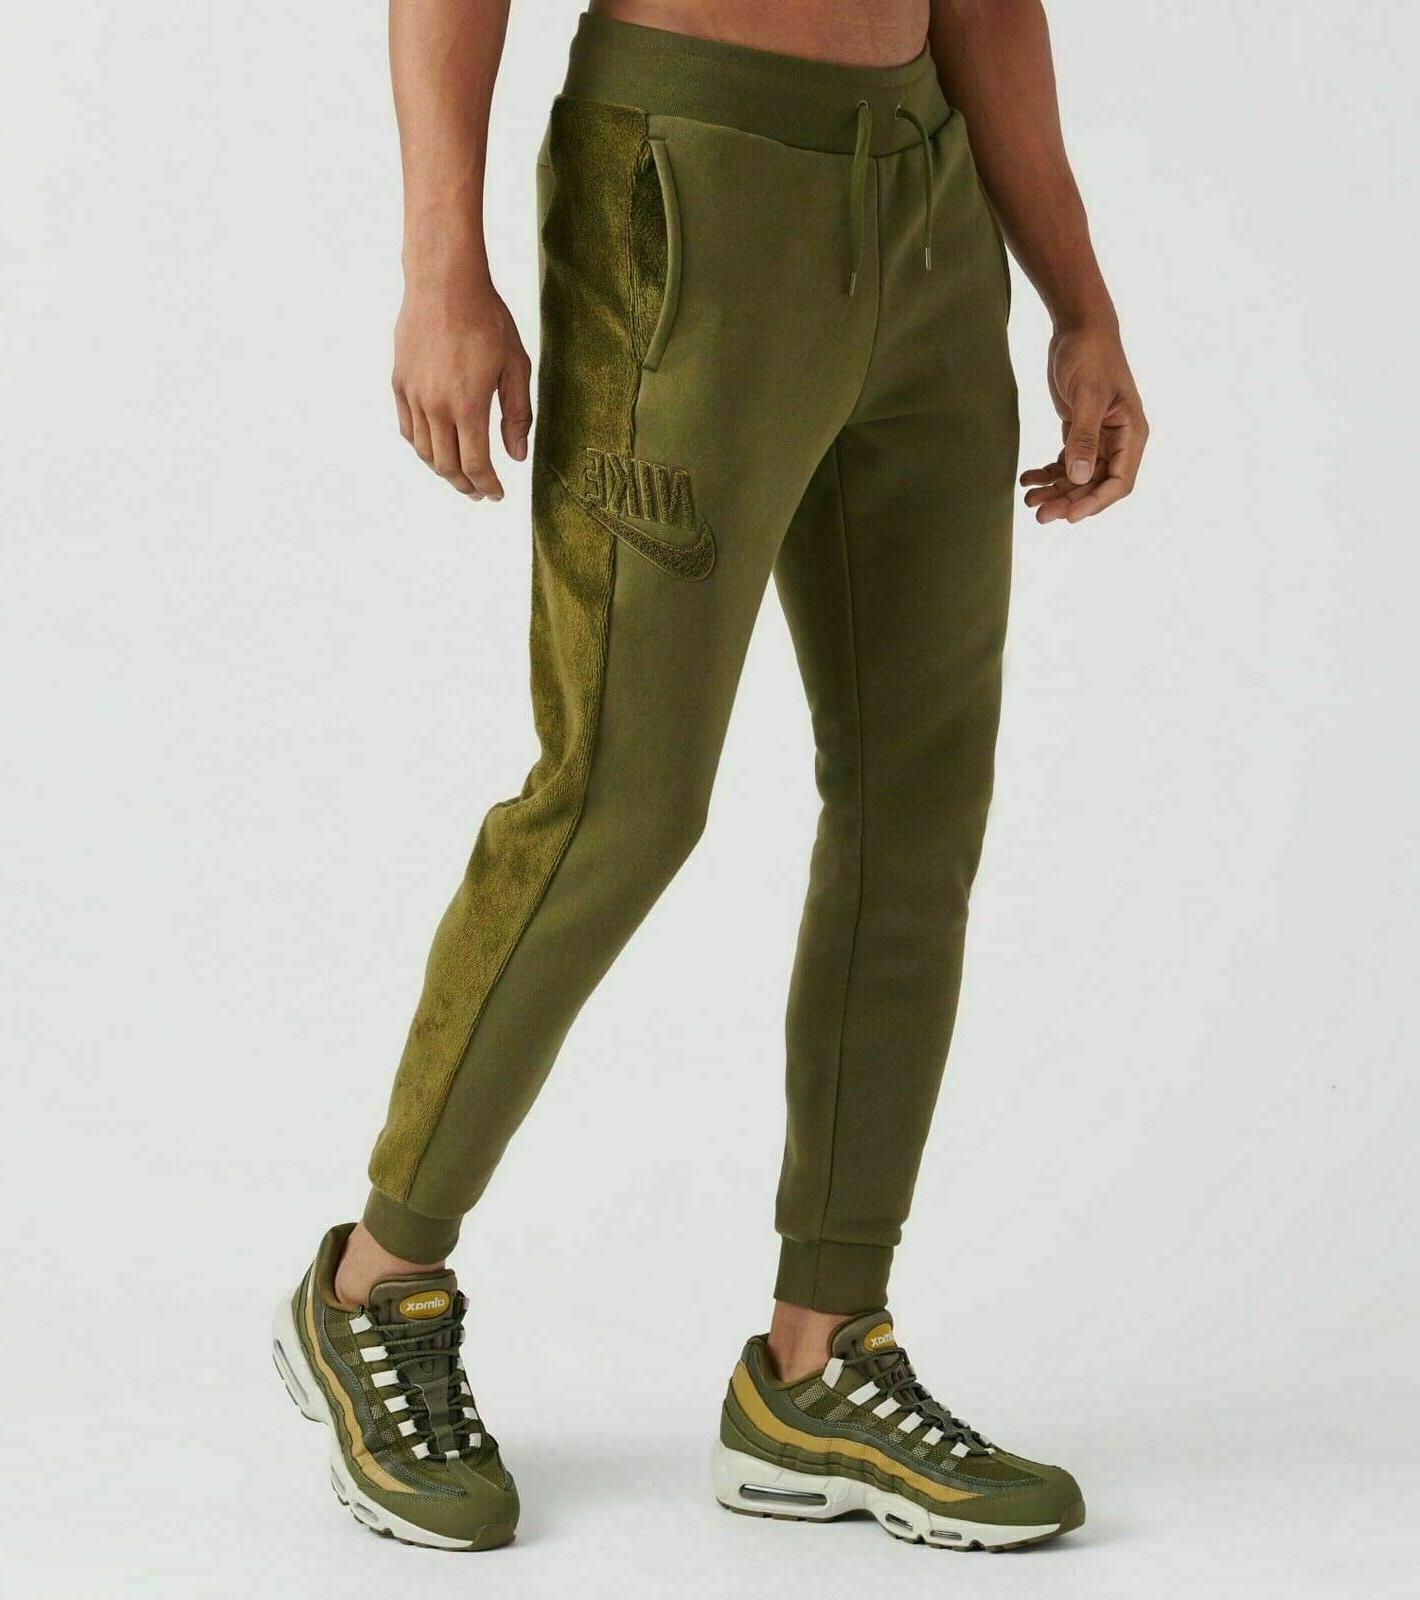 sherpa winter jogger sweatpants green 929130 395